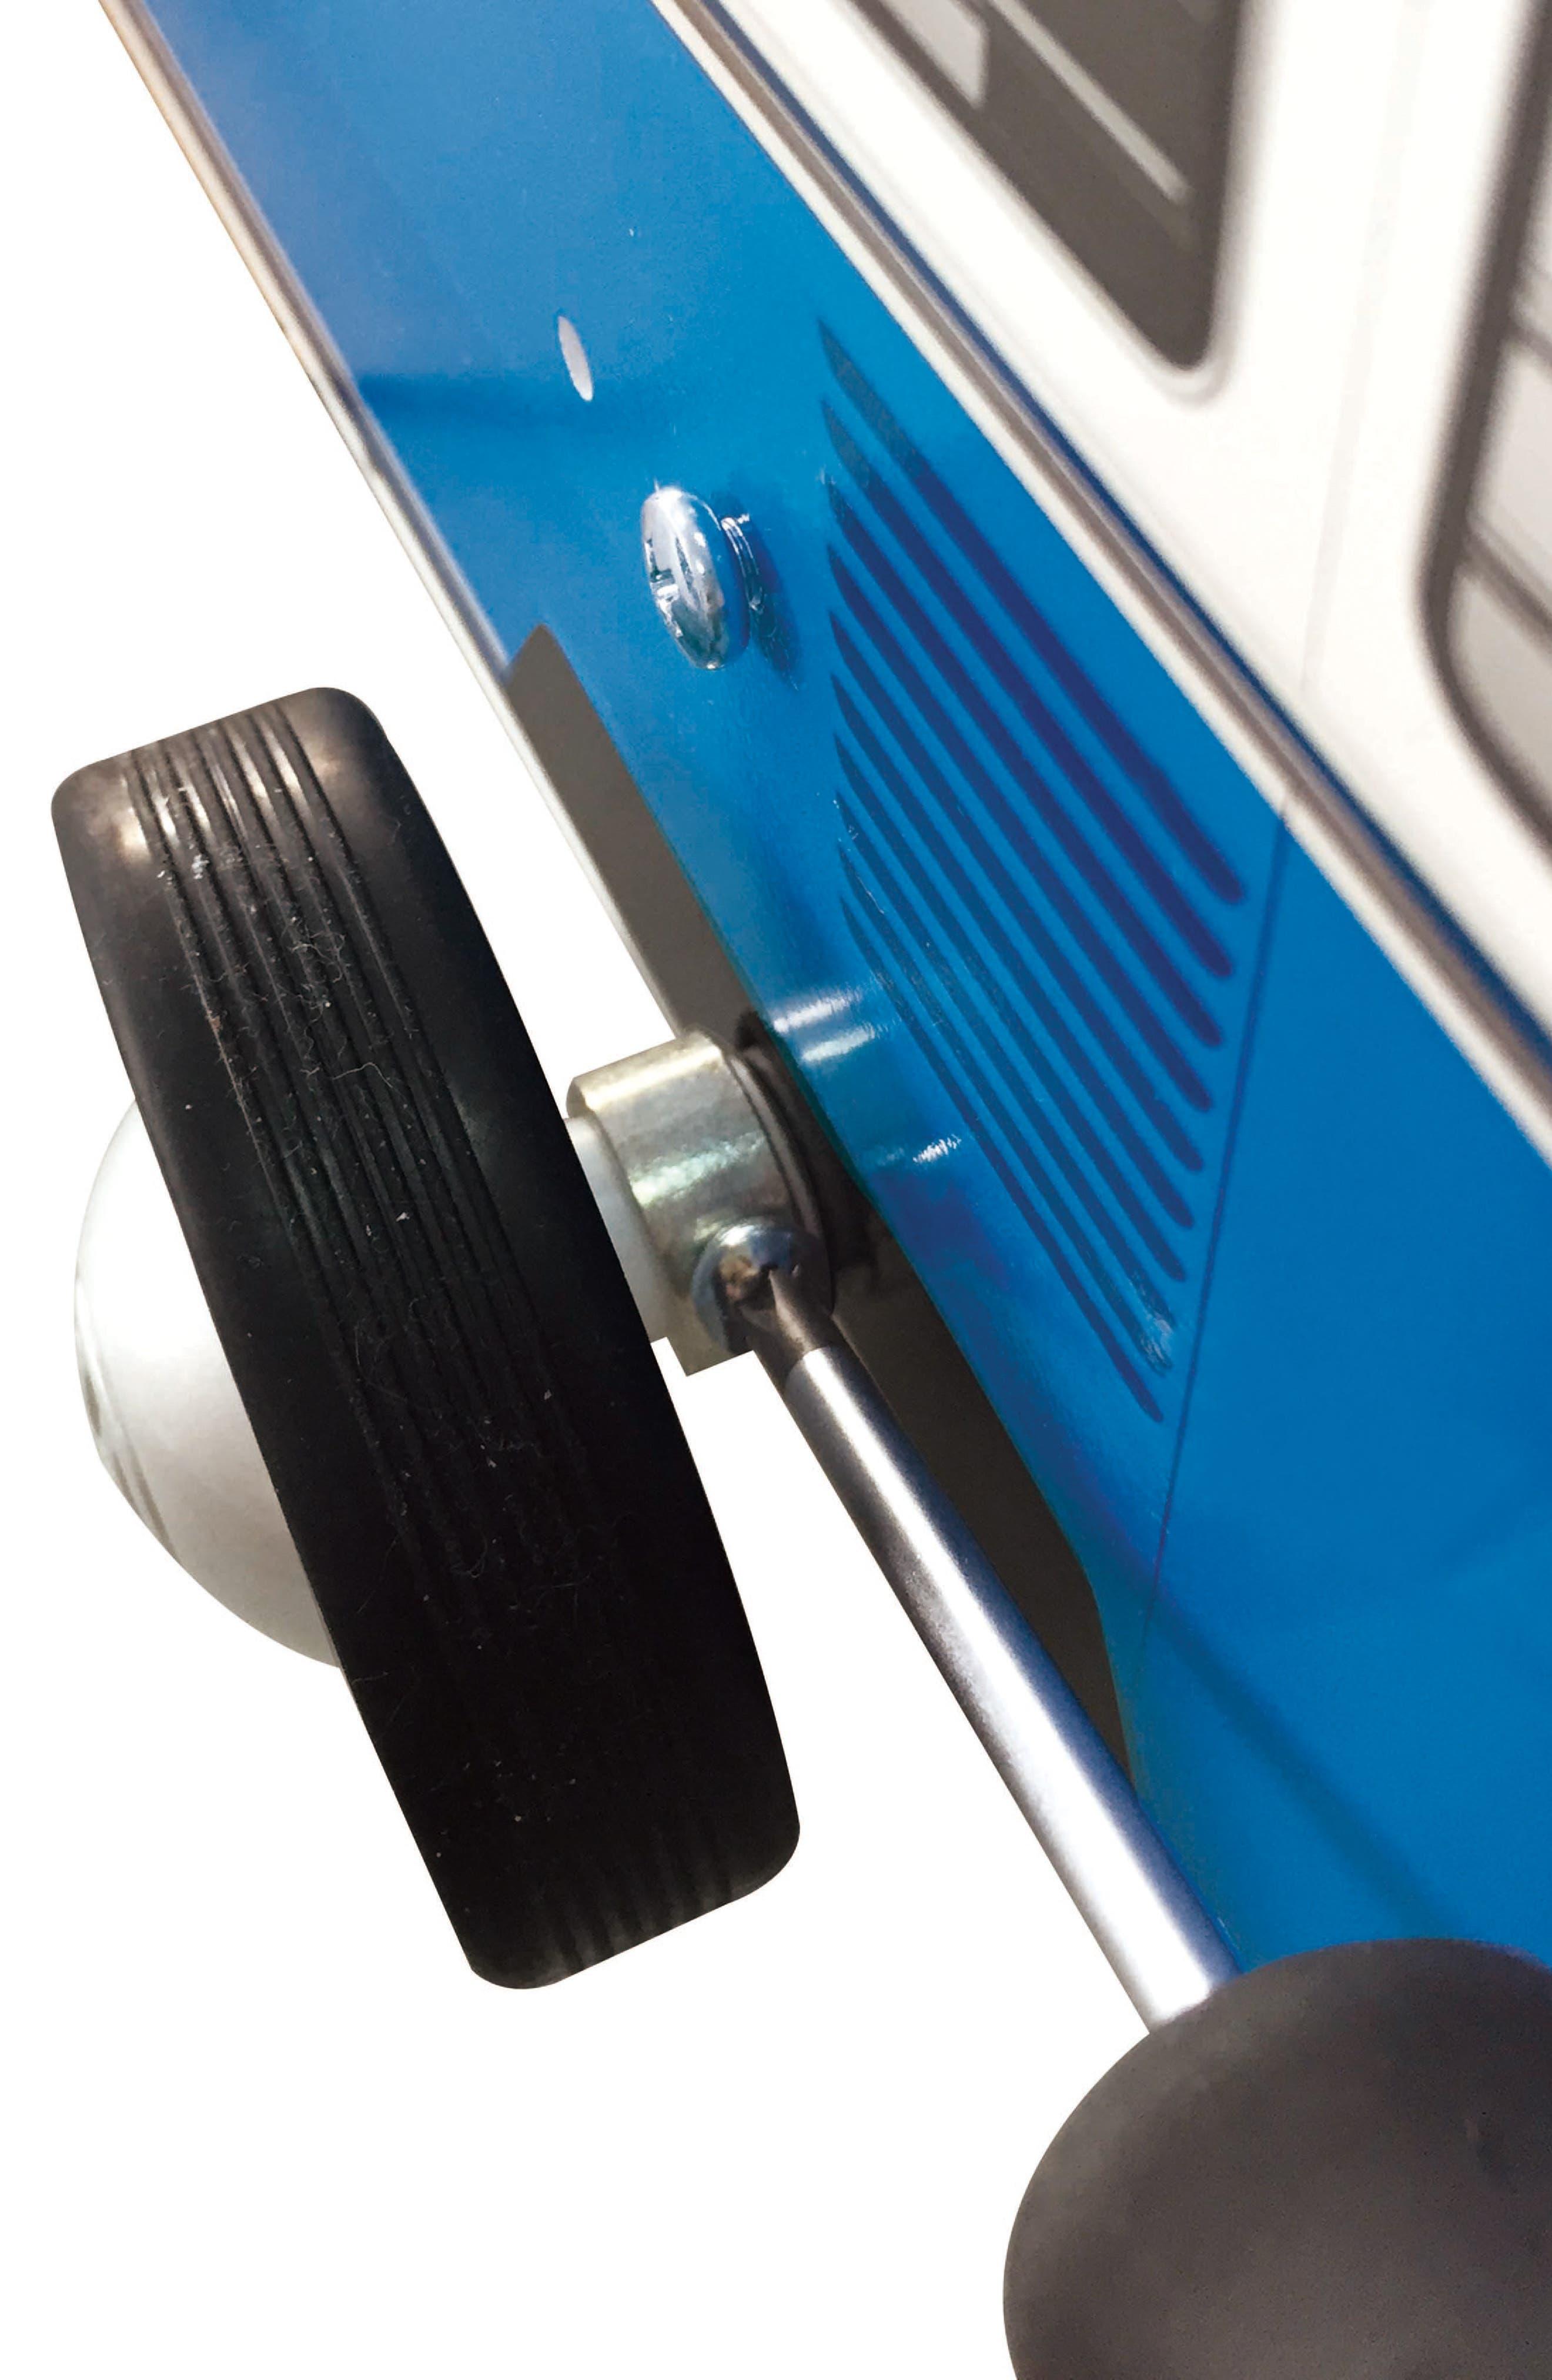 Classical VW Push Bus,                             Alternate thumbnail 6, color,                             Blue